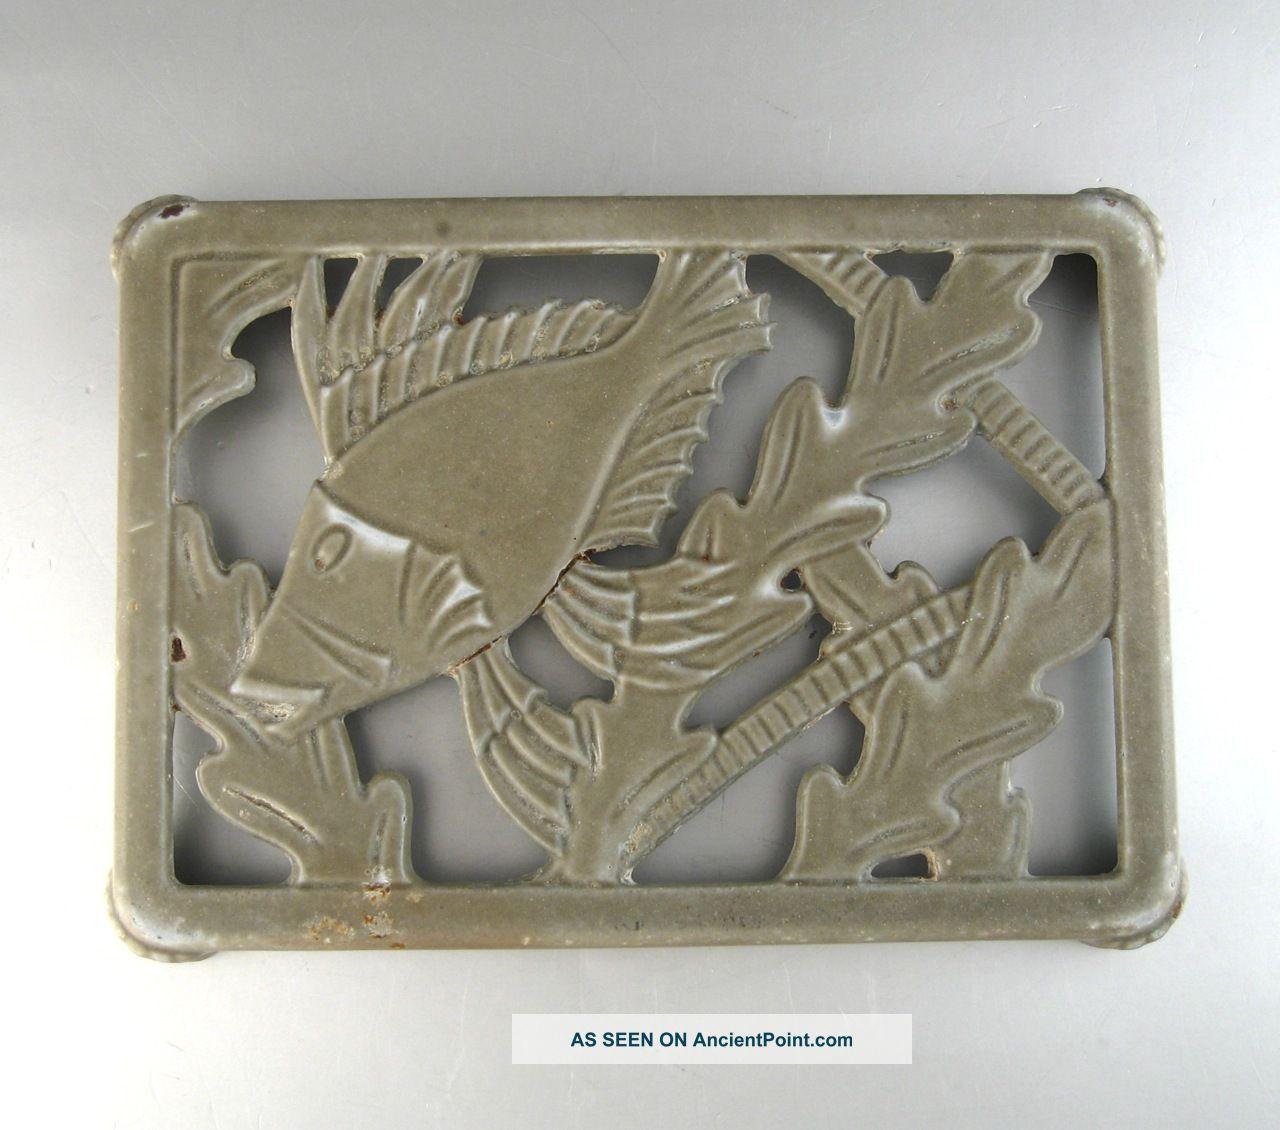 Vintage Frenchenamel Cast Iron Trivet,  Fish Trivets photo